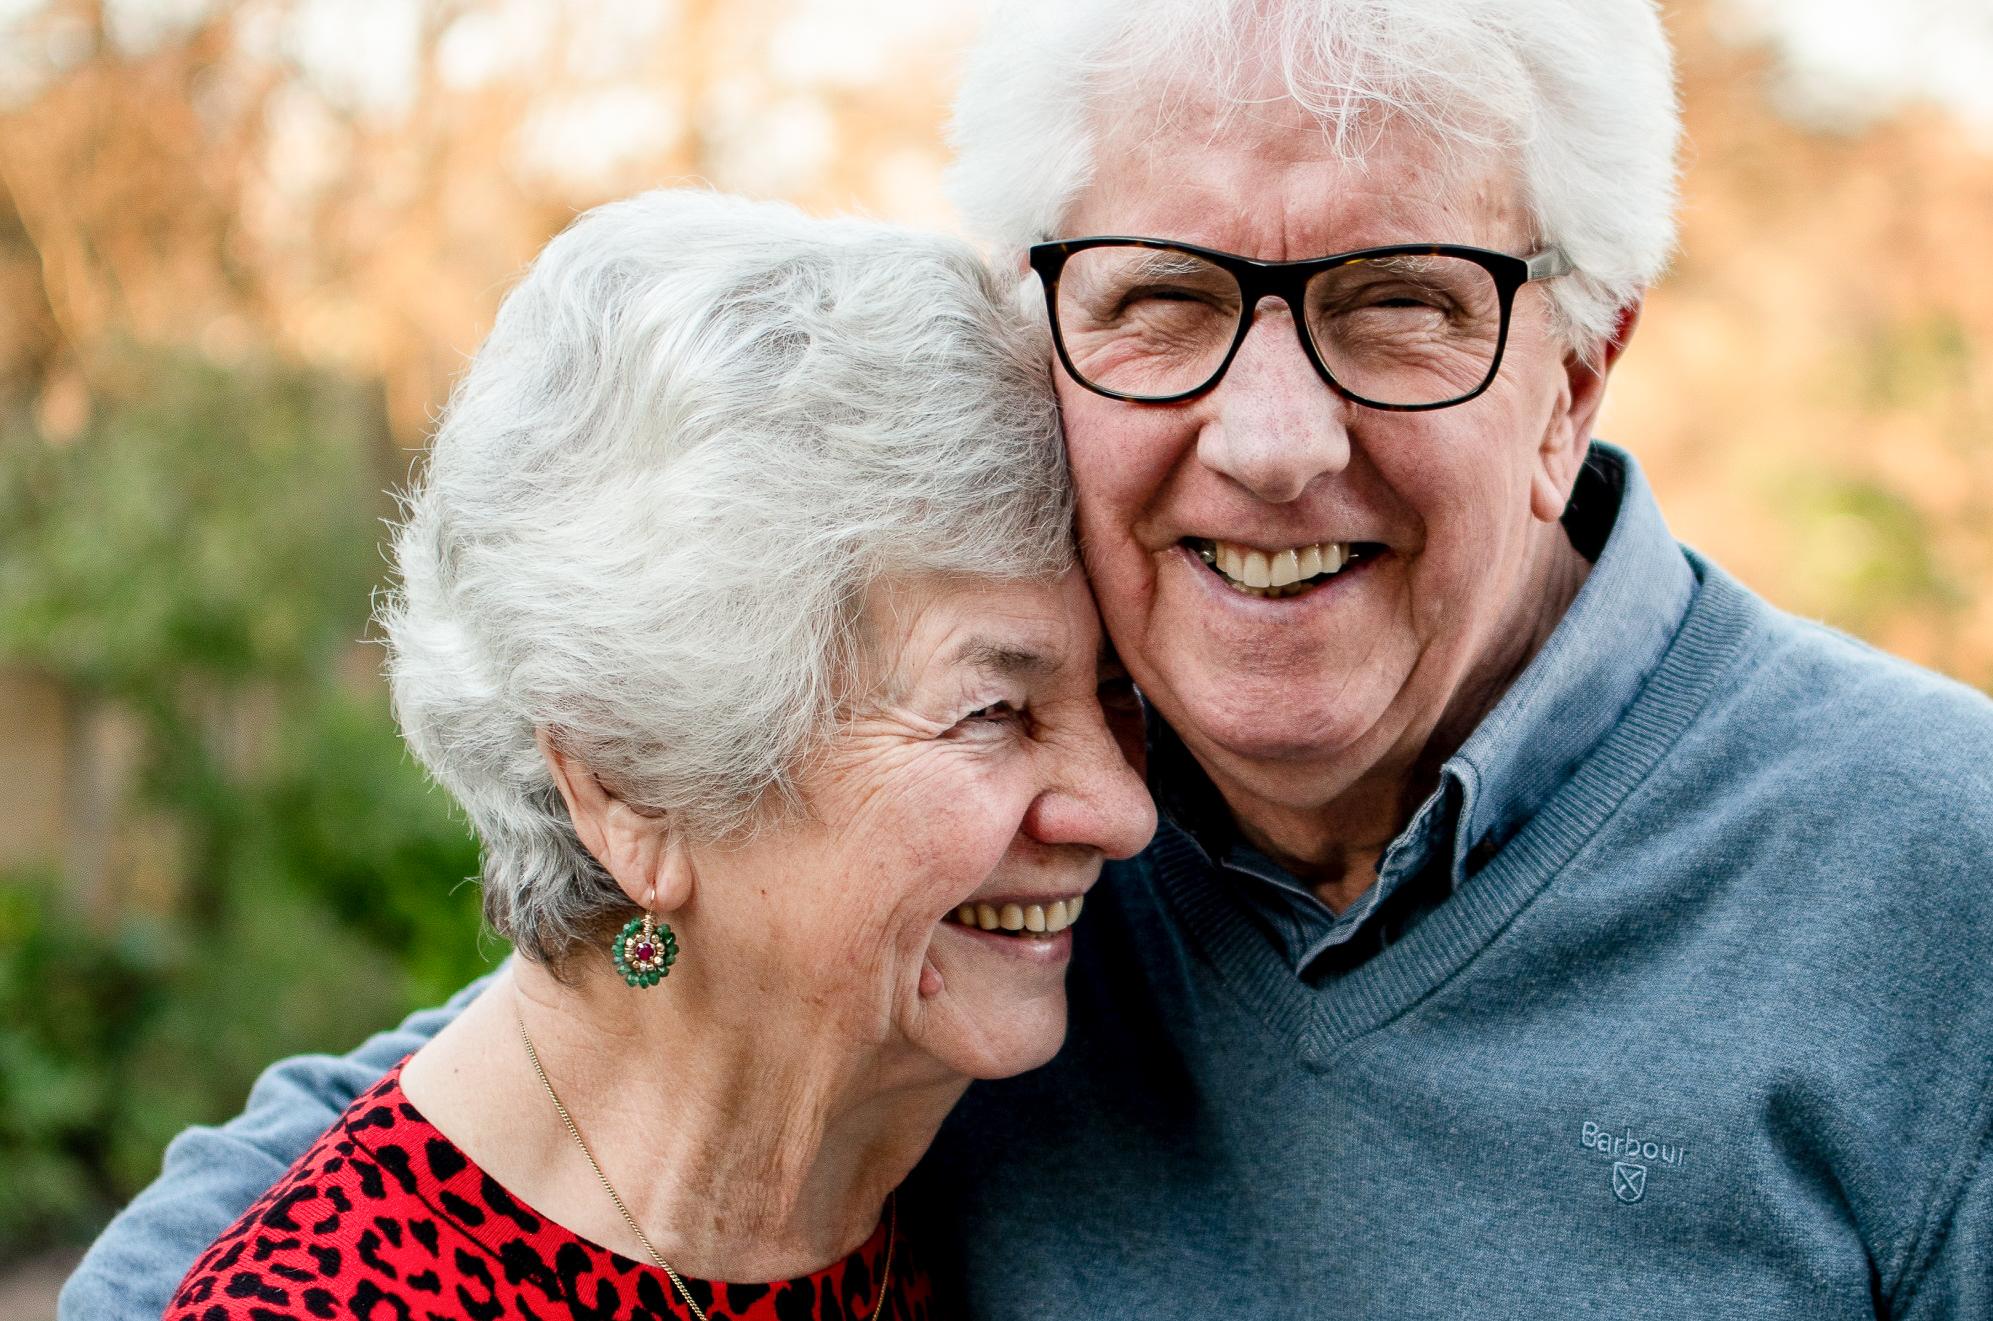 The importance of dental hygiene for older adults